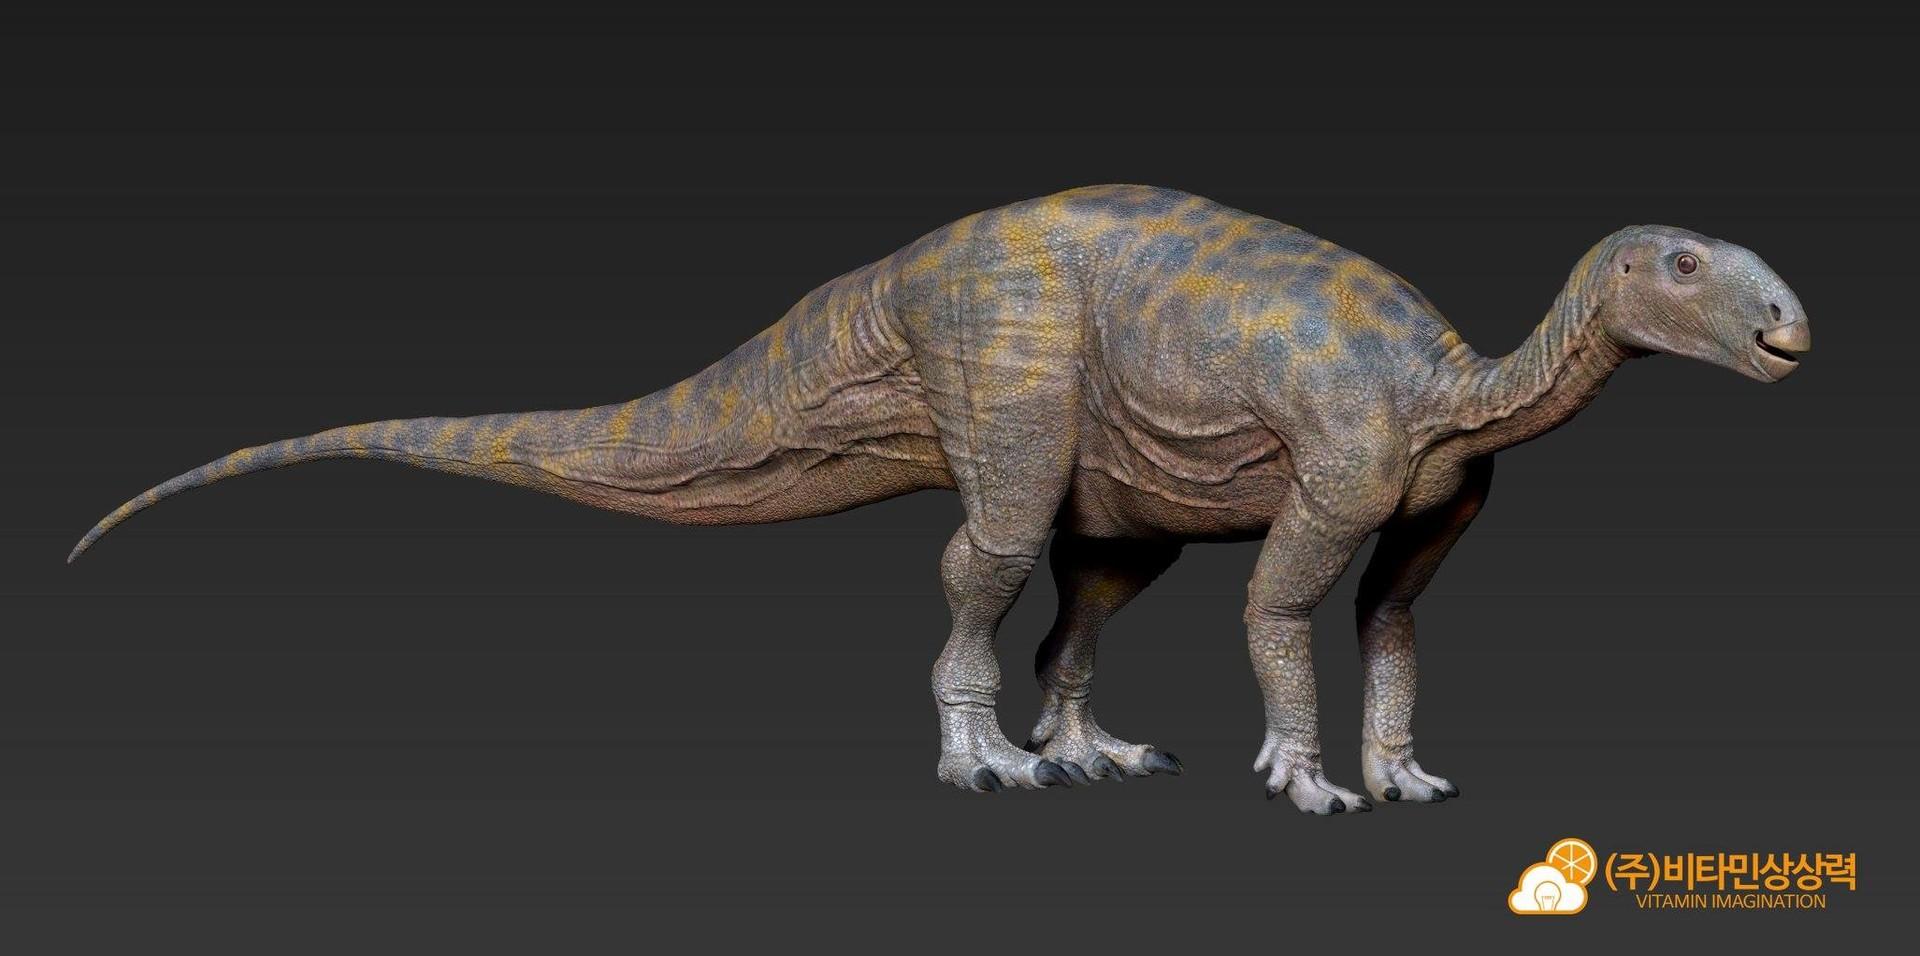 Jin kyeom kim tenontosaurus